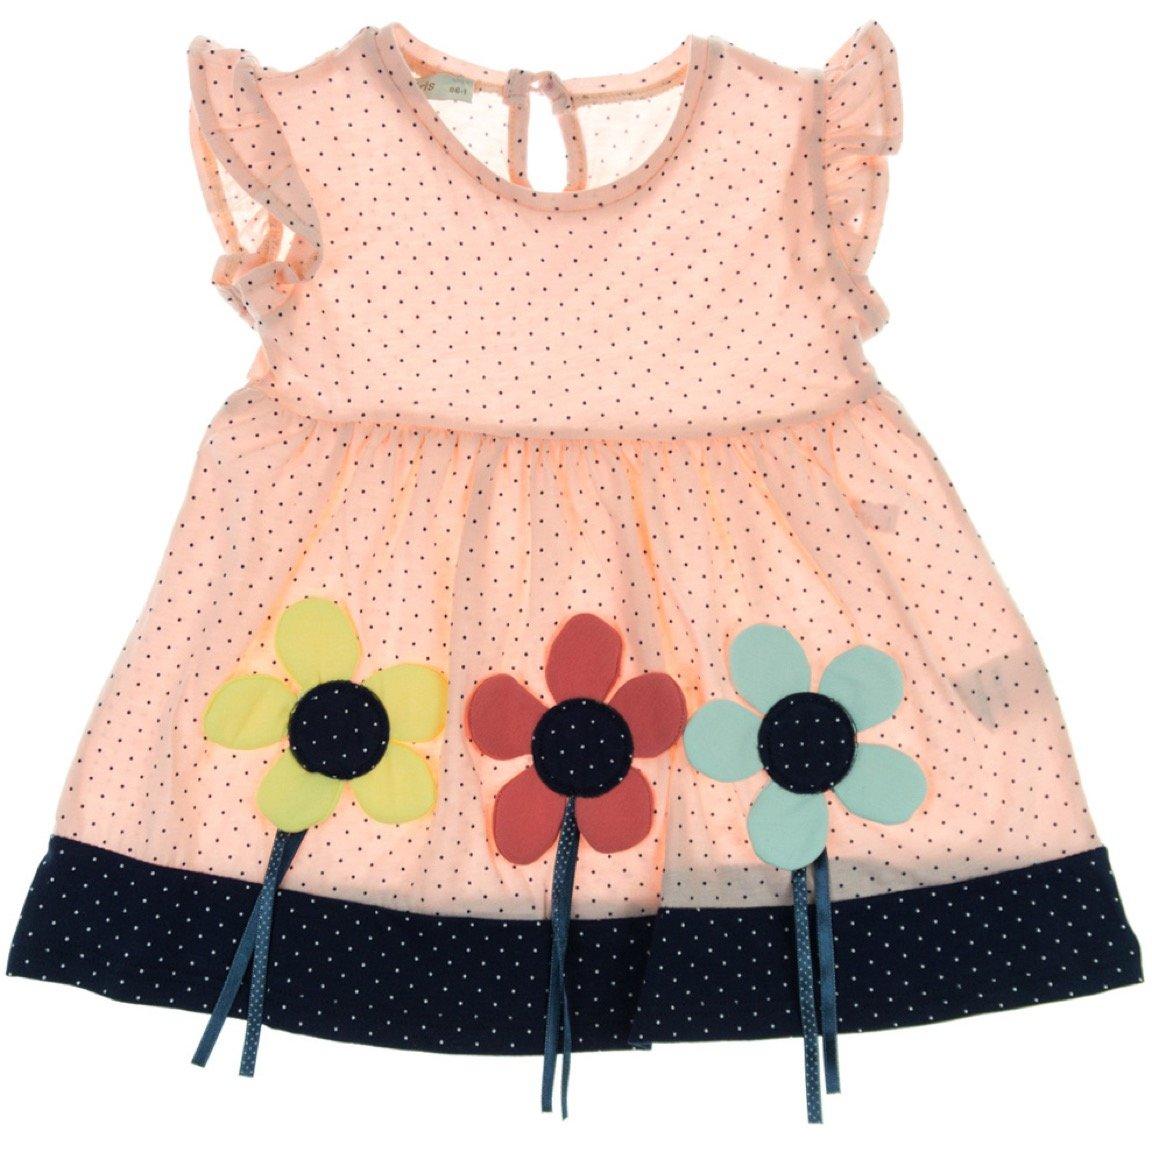 Via Girls παιδικό φόρεμα «Big Pink Flowers»